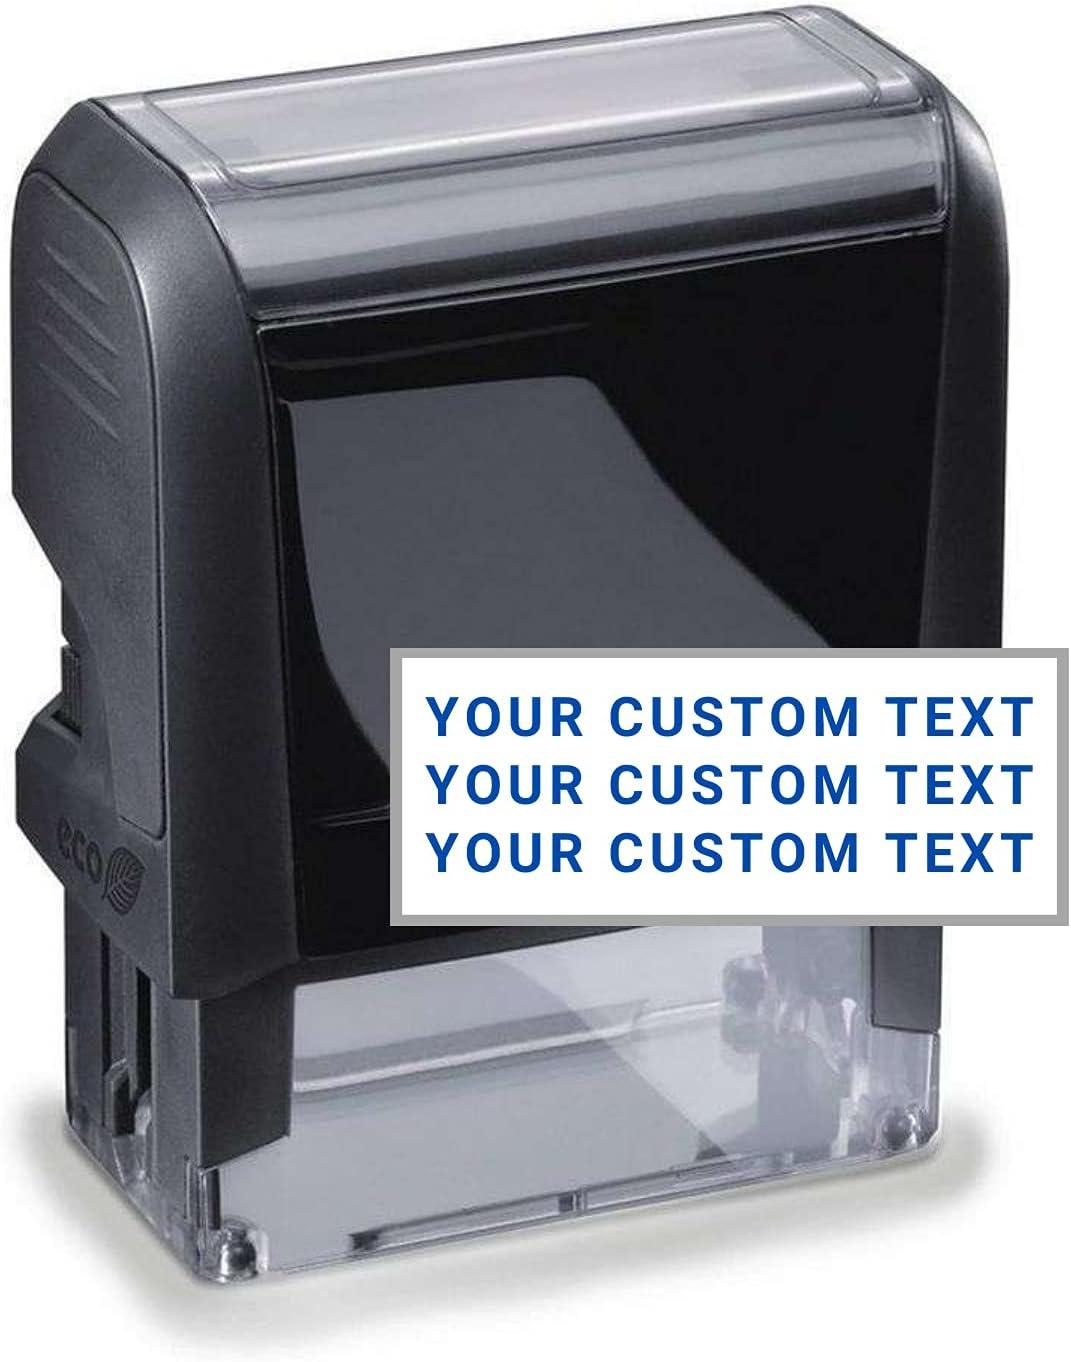 Custom Address Sale Stamp - 20 Font Options Addr Self-Inking Line Max 52% OFF 3